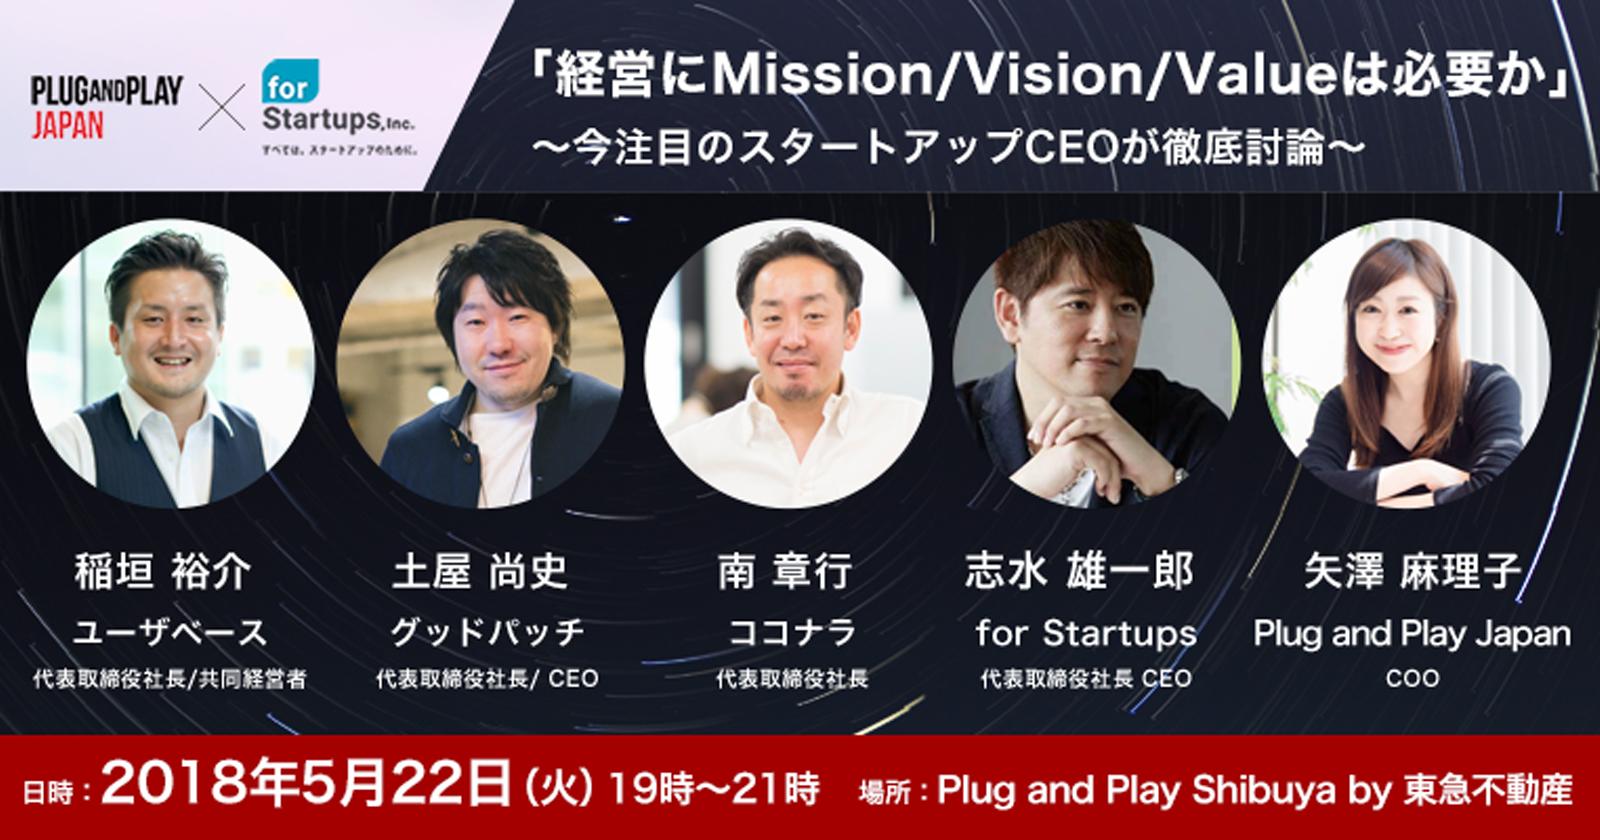 Plug and Play Japanとの共催イベント『経営にMission/Vision/Valueは必要か〜今注目のスタートアップCEOが徹底討論〜』を開催。for Startups代表の志水が登壇いたします。